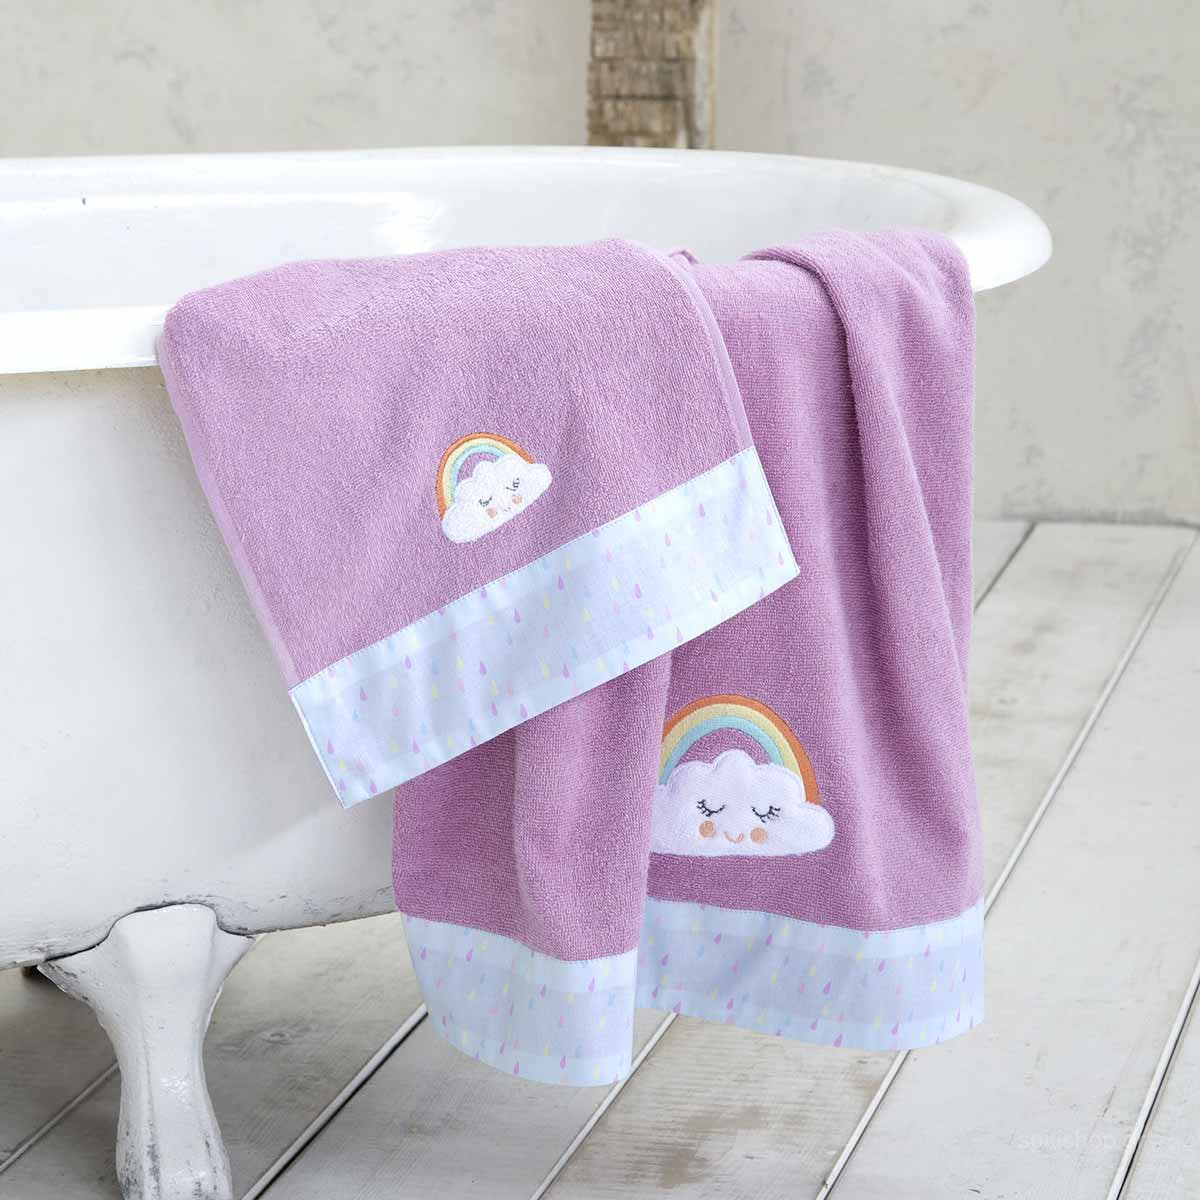 0e77d7531c0 -10% Spiti Shop Παιδικές Πετσέτες (Σετ 3τμχ) Nima Kids Pawnee